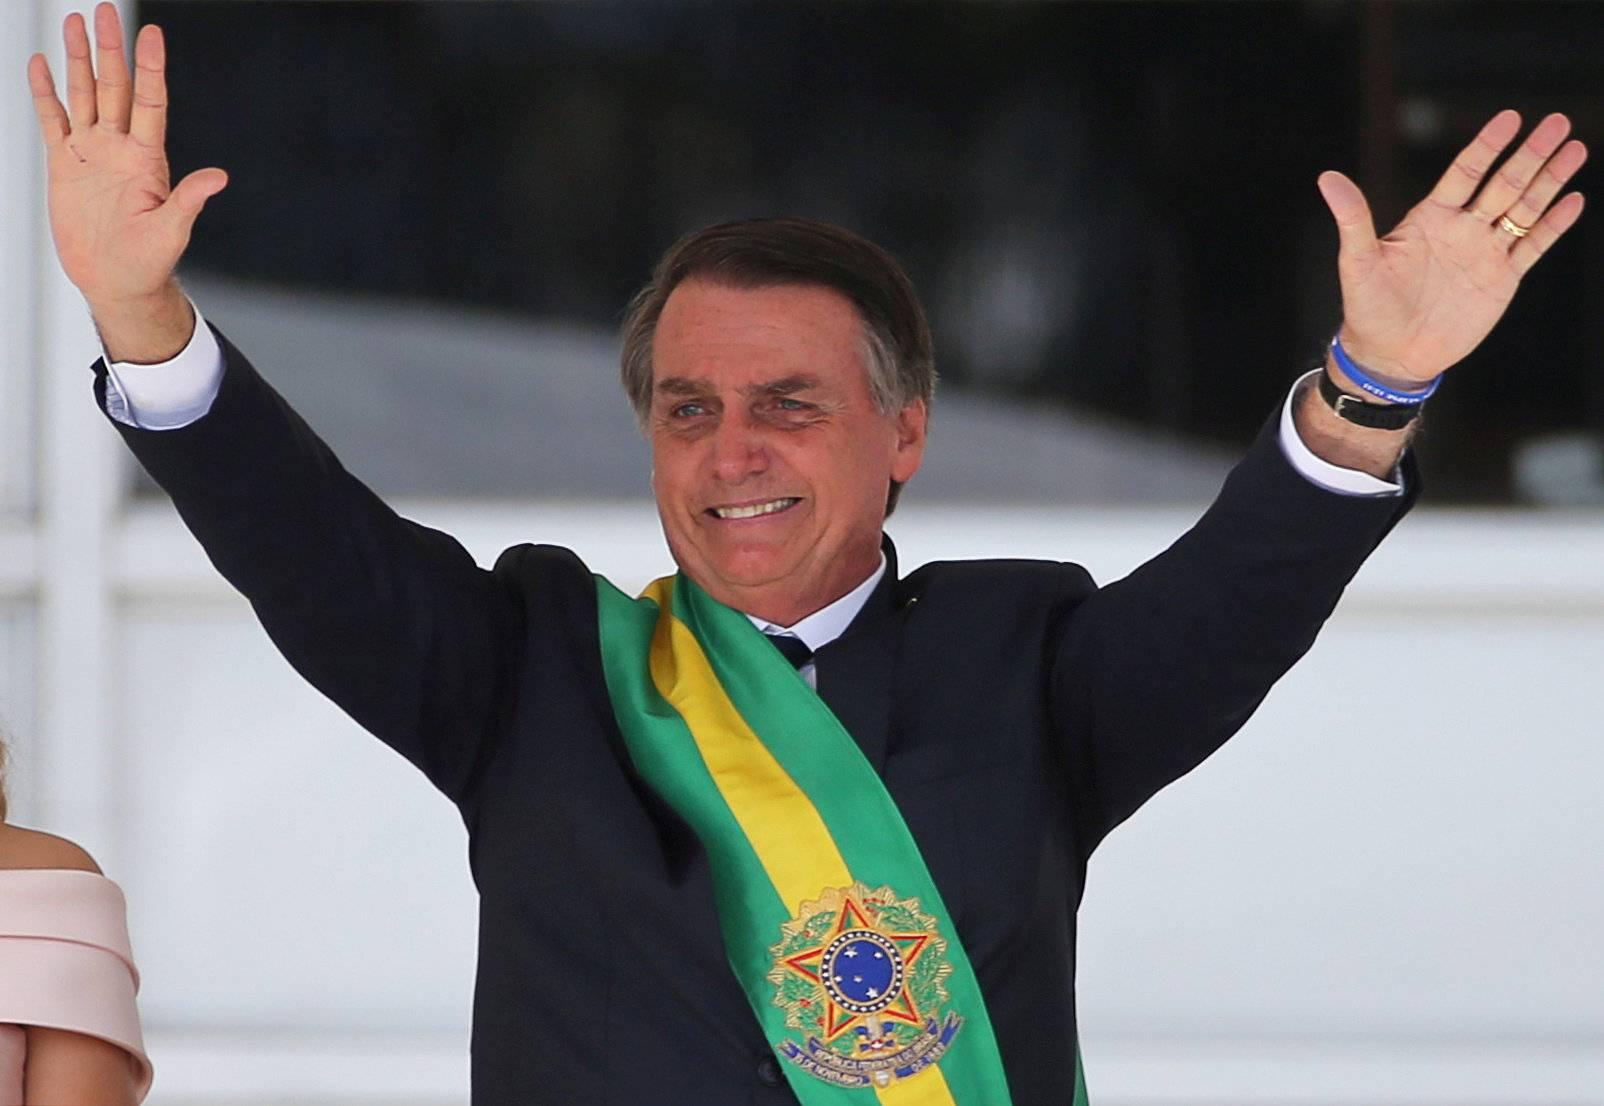 FILE PHOTO: Jair Bolsonaro takes office as Brazil's President